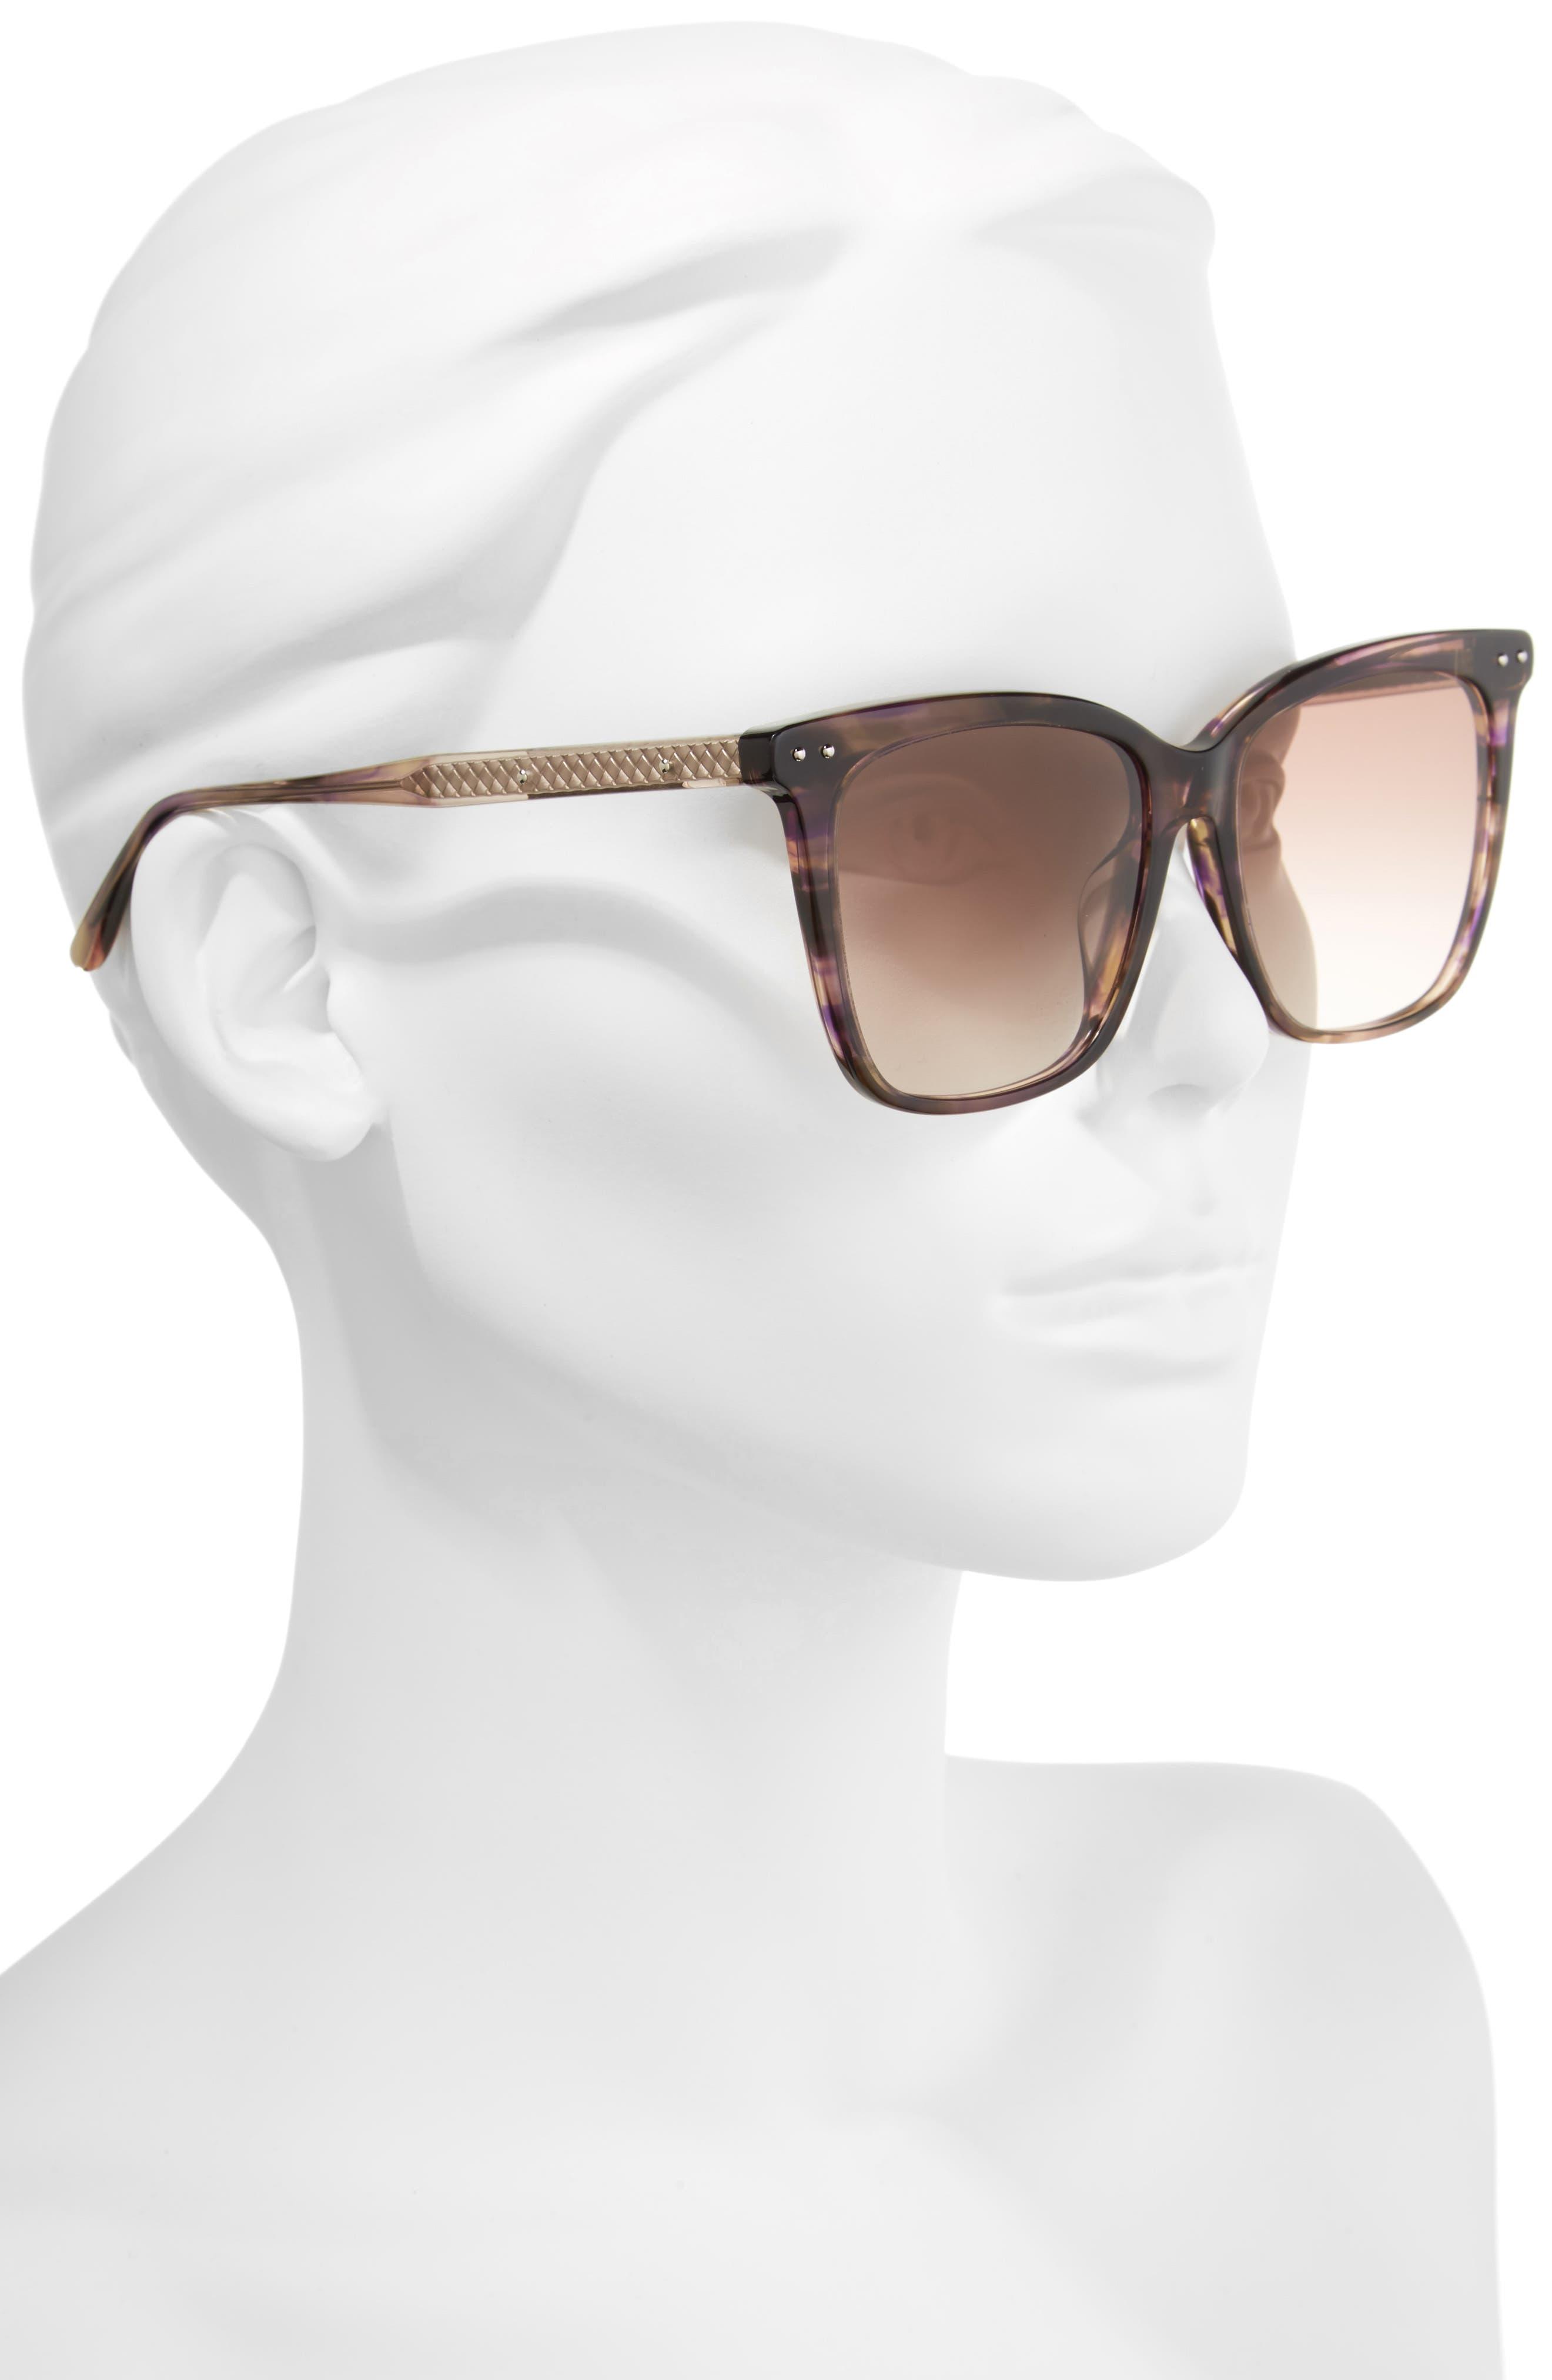 54mm Square Sunglasses,                             Alternate thumbnail 5, color,